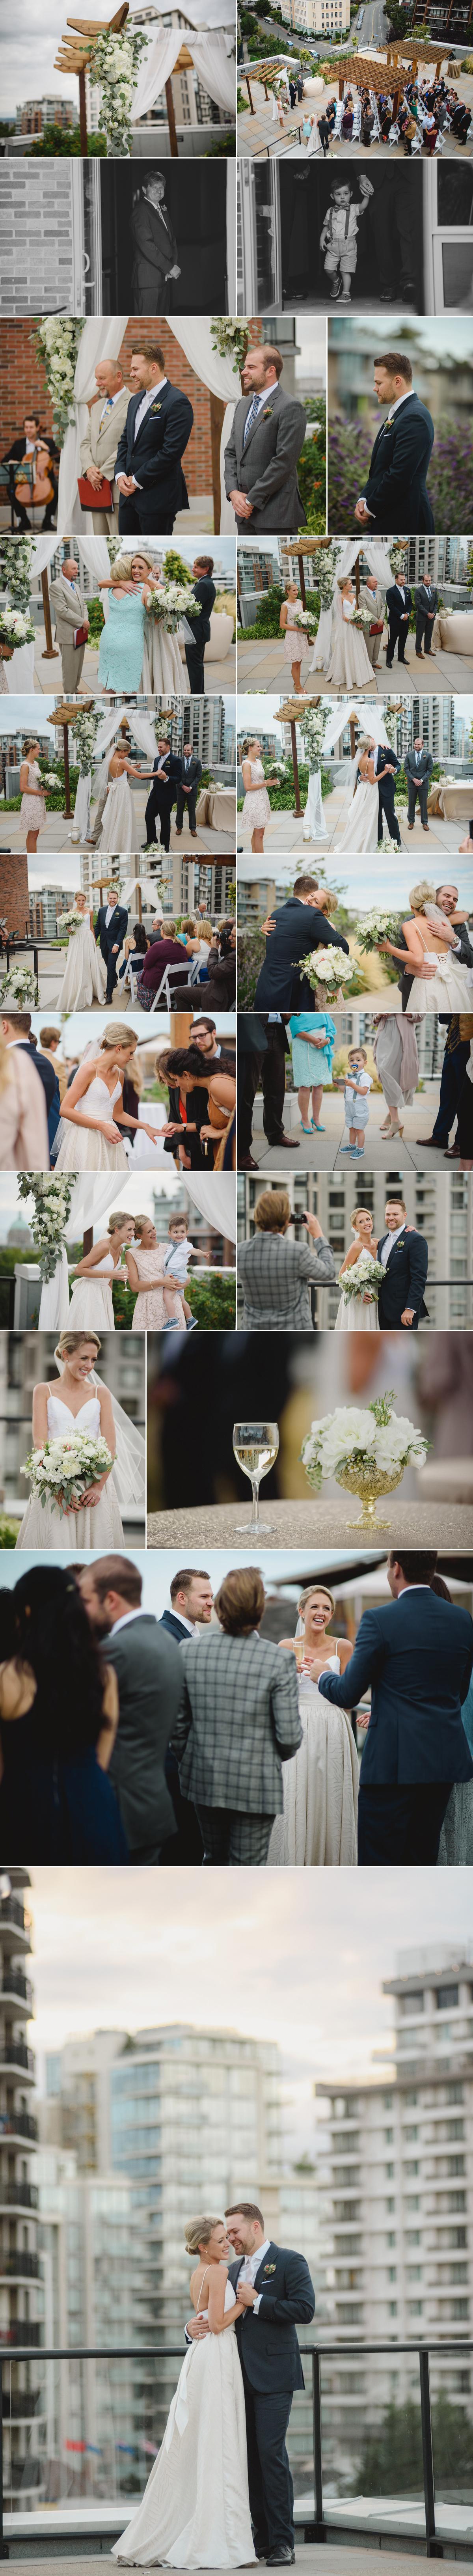 parkside wedding, victoria bc, rooftop wedding ceremony, city wedding, city chic wedding, erin wallis photography